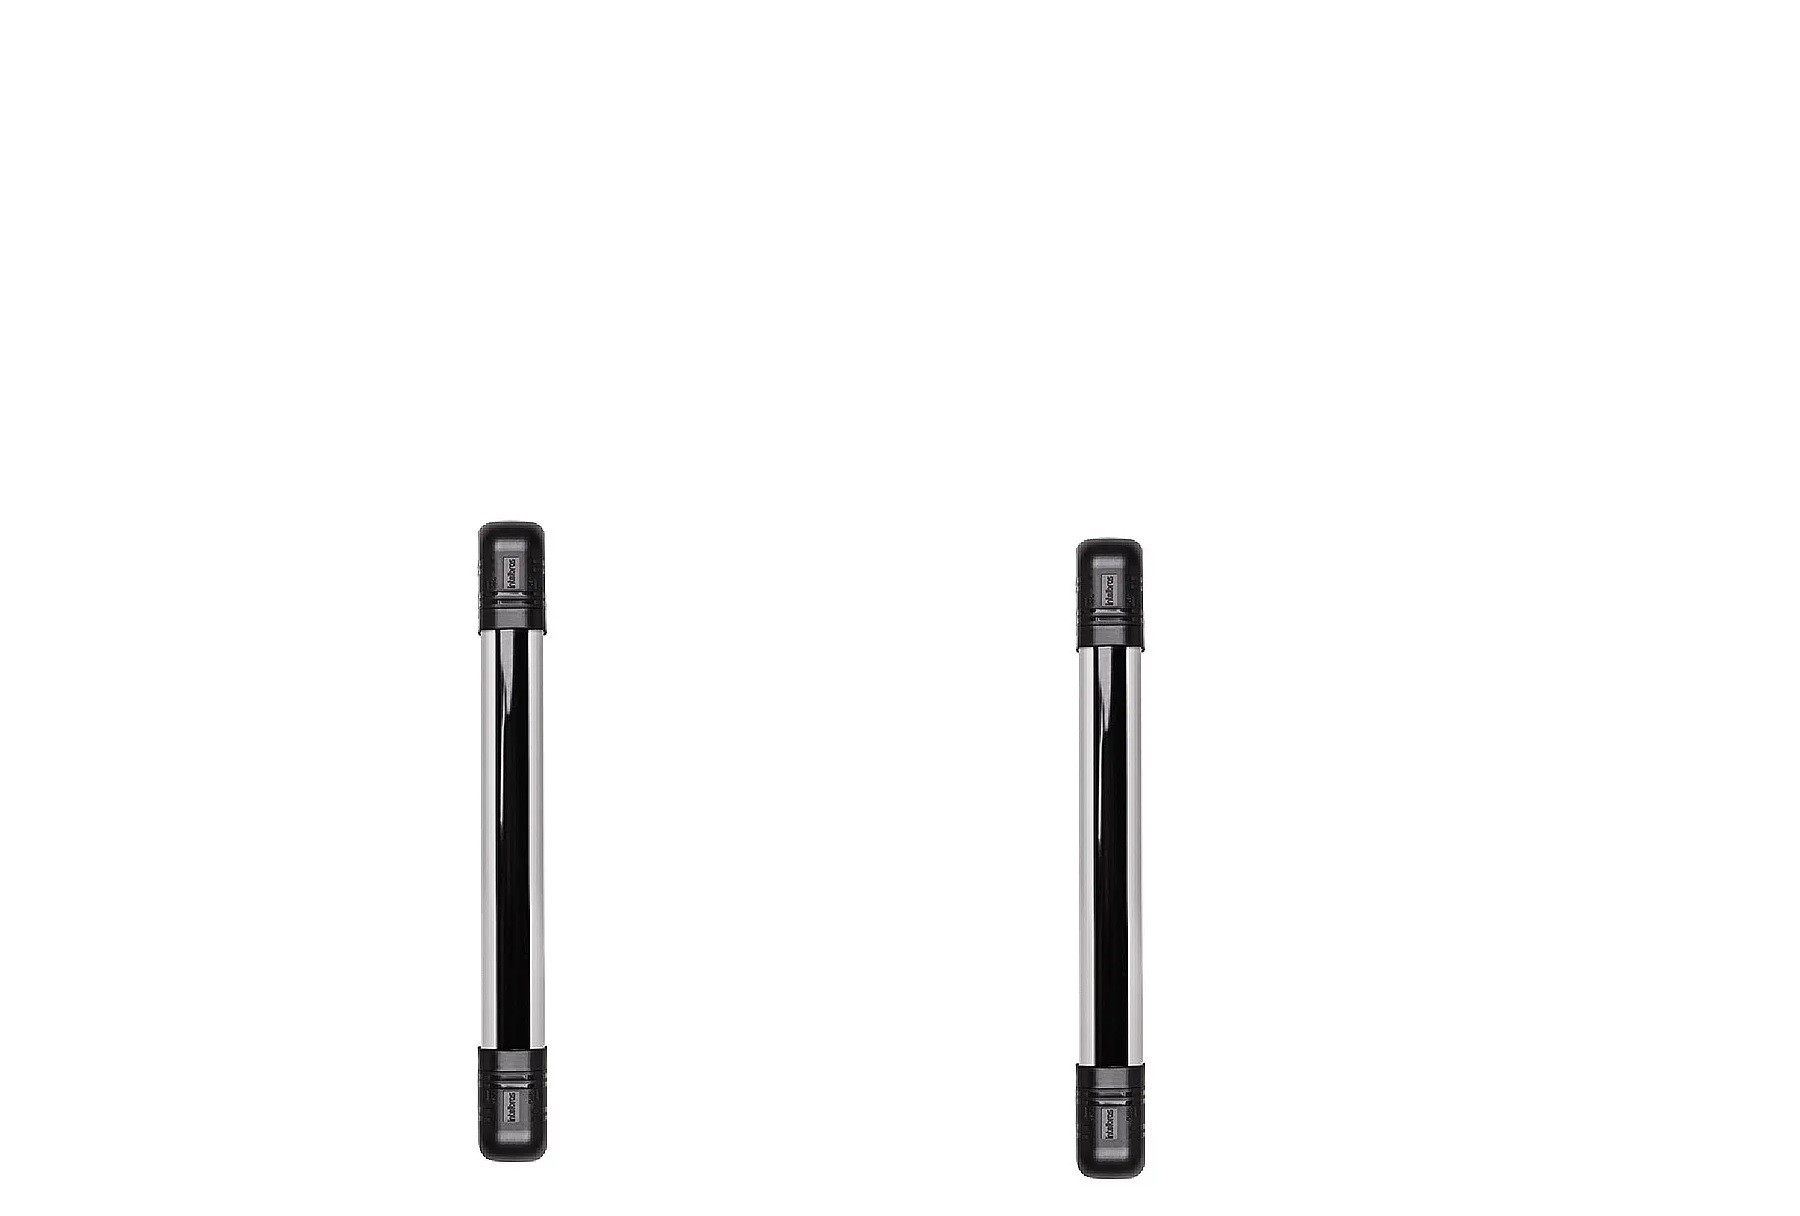 Sensor Barreira Intelbras 100 Metros Iva 7100 Dual 2 Feixes